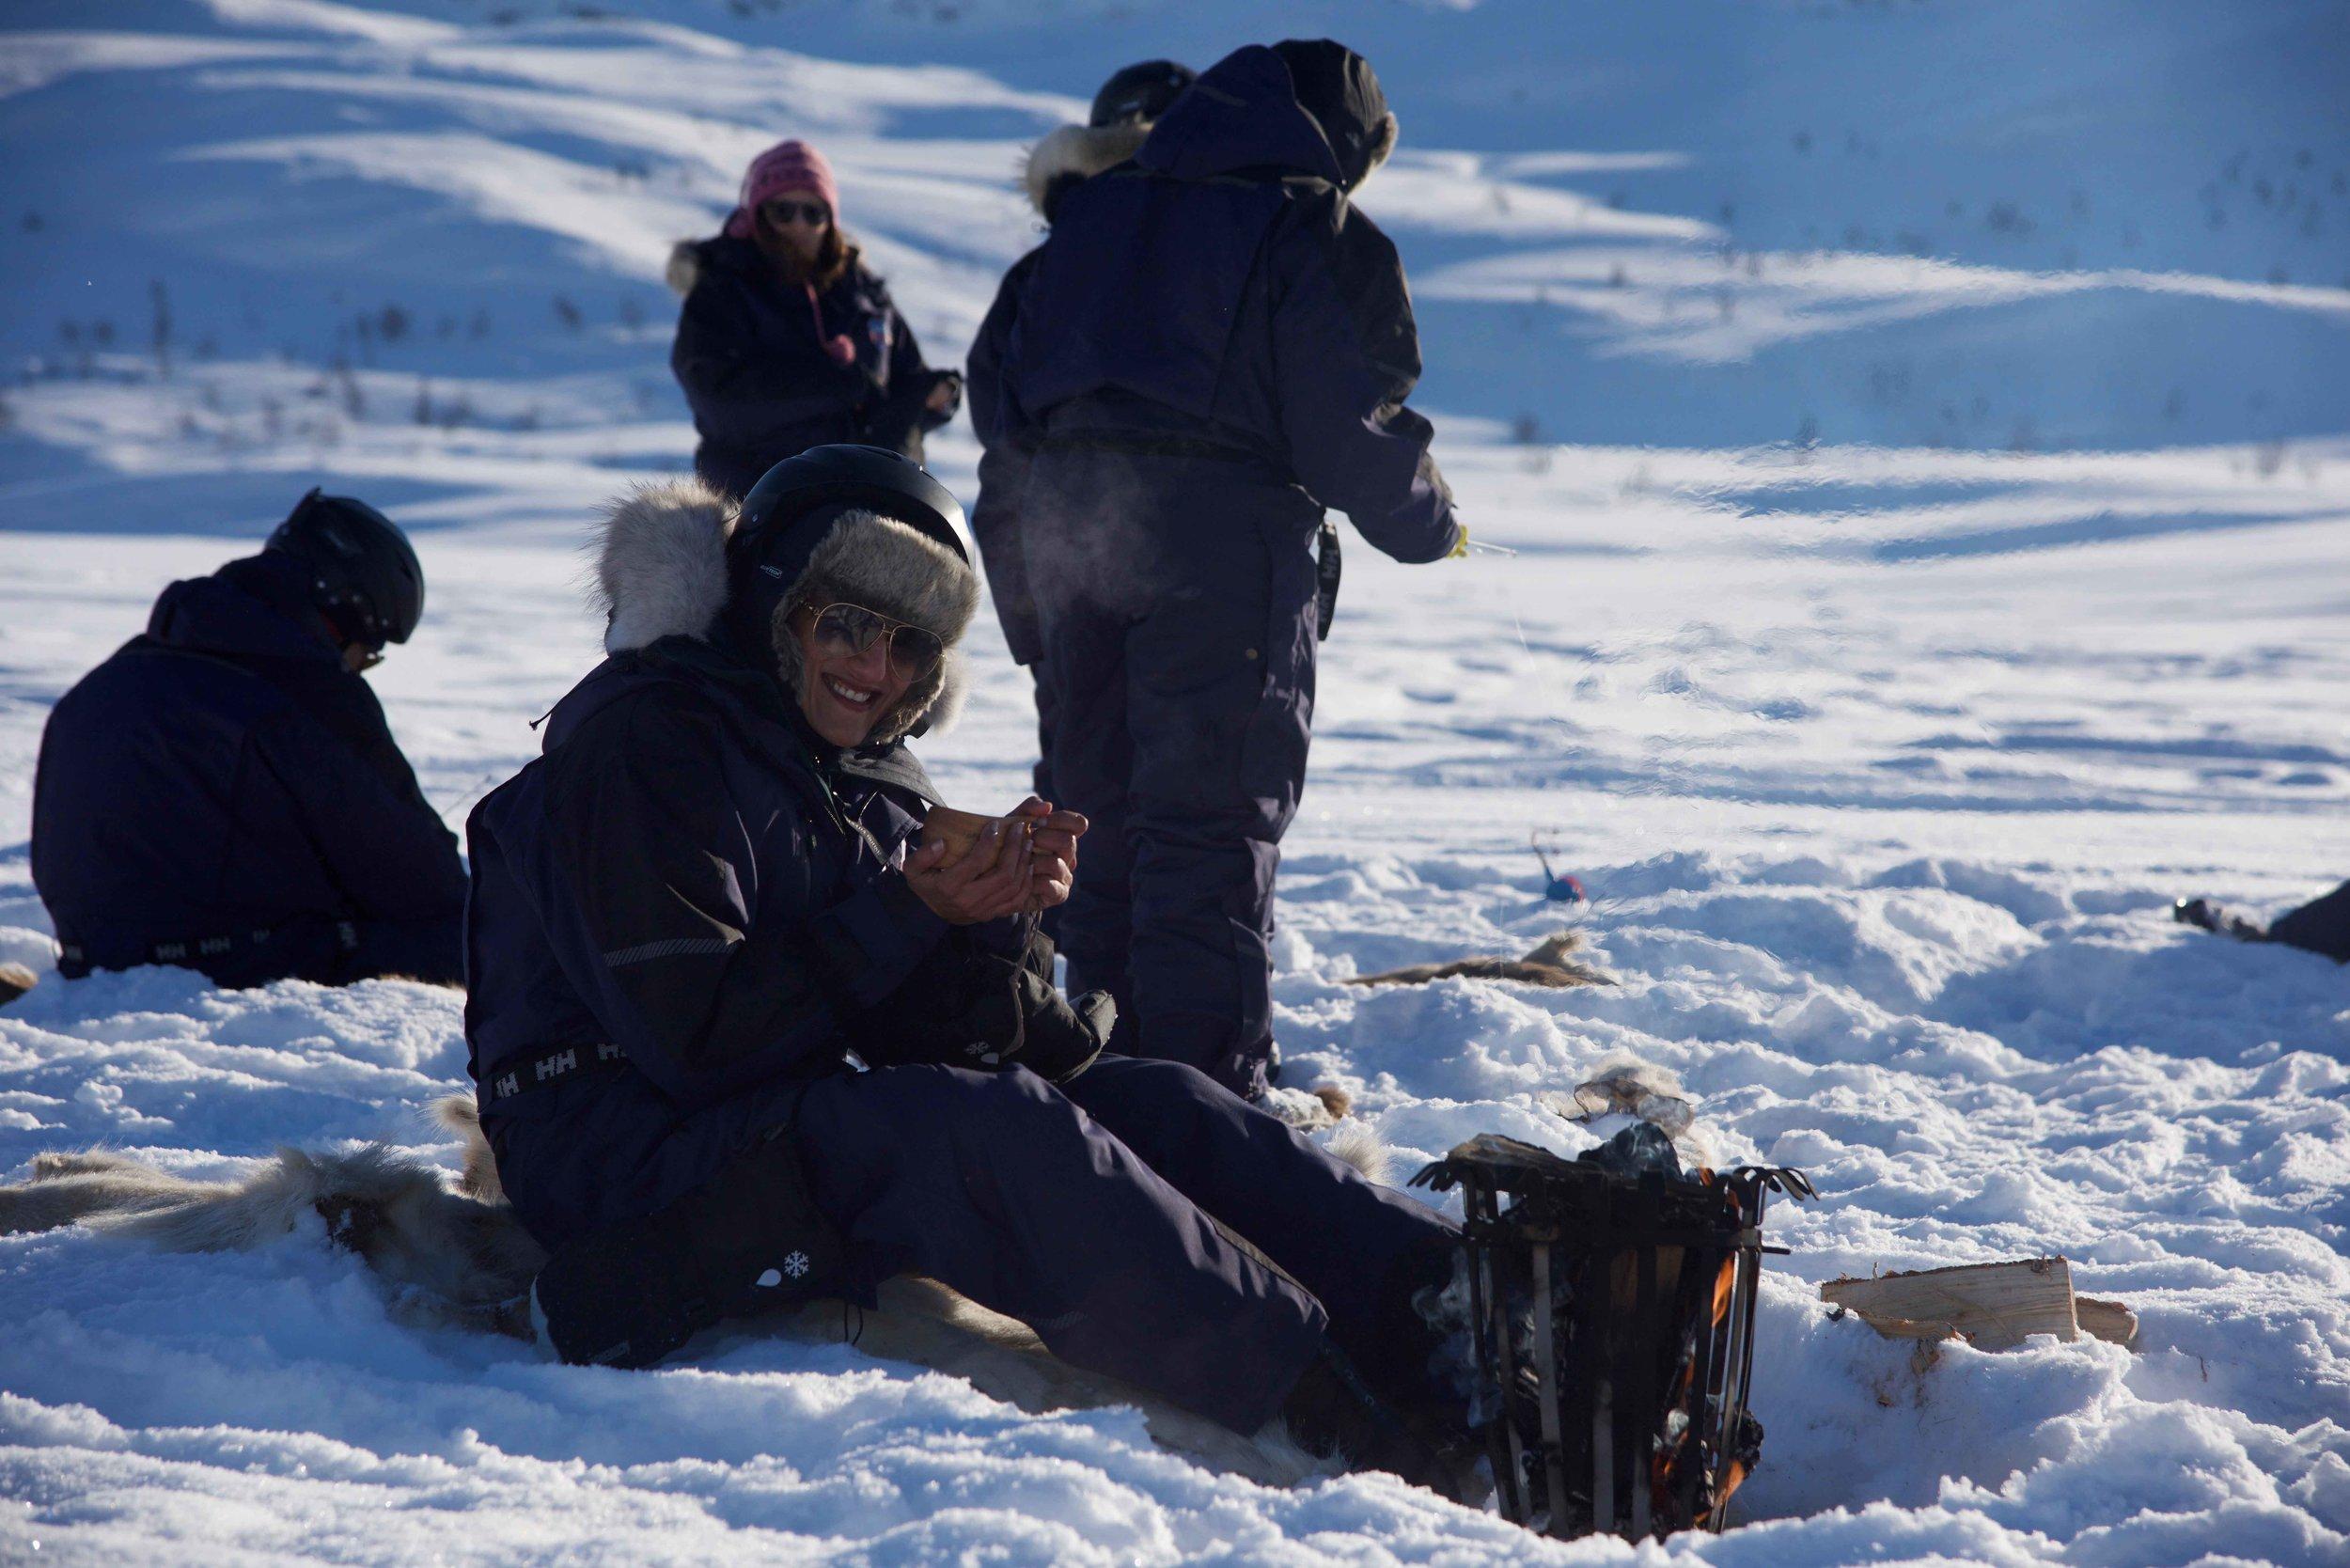 high frozen lakes, Arctic Circle, Norway. Image©thingstodot.com